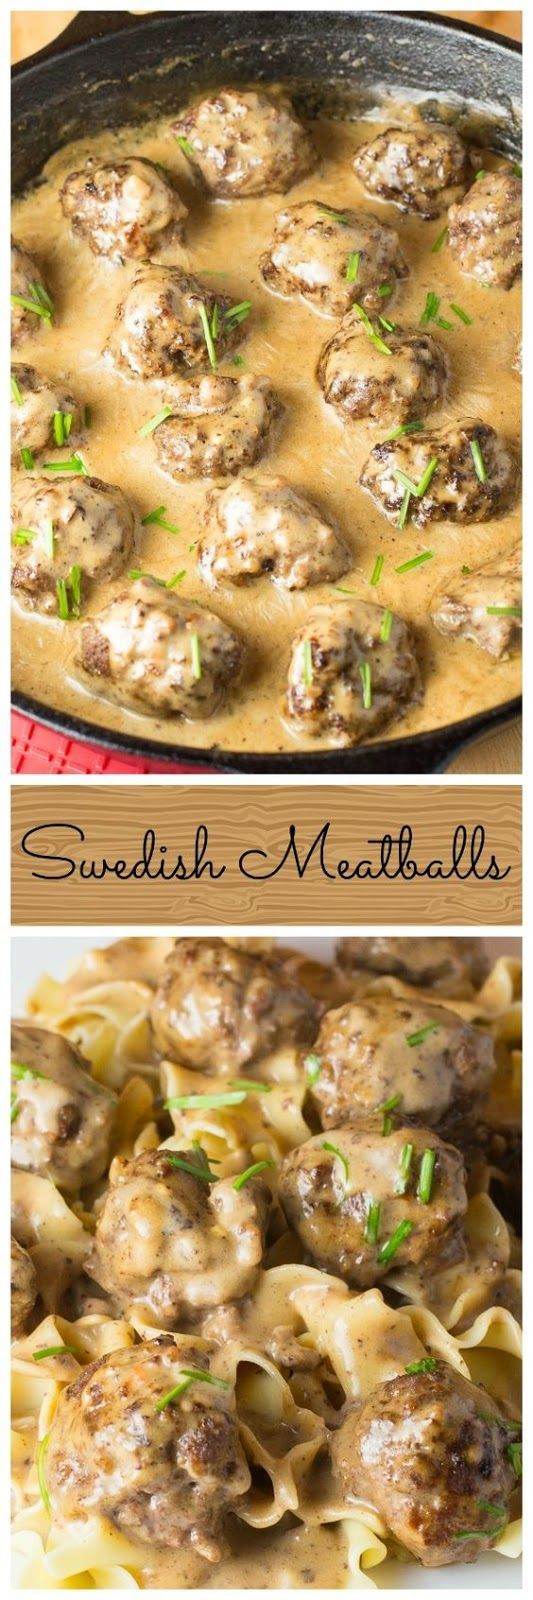 Swedish Meatballs 50 Mins to Make: